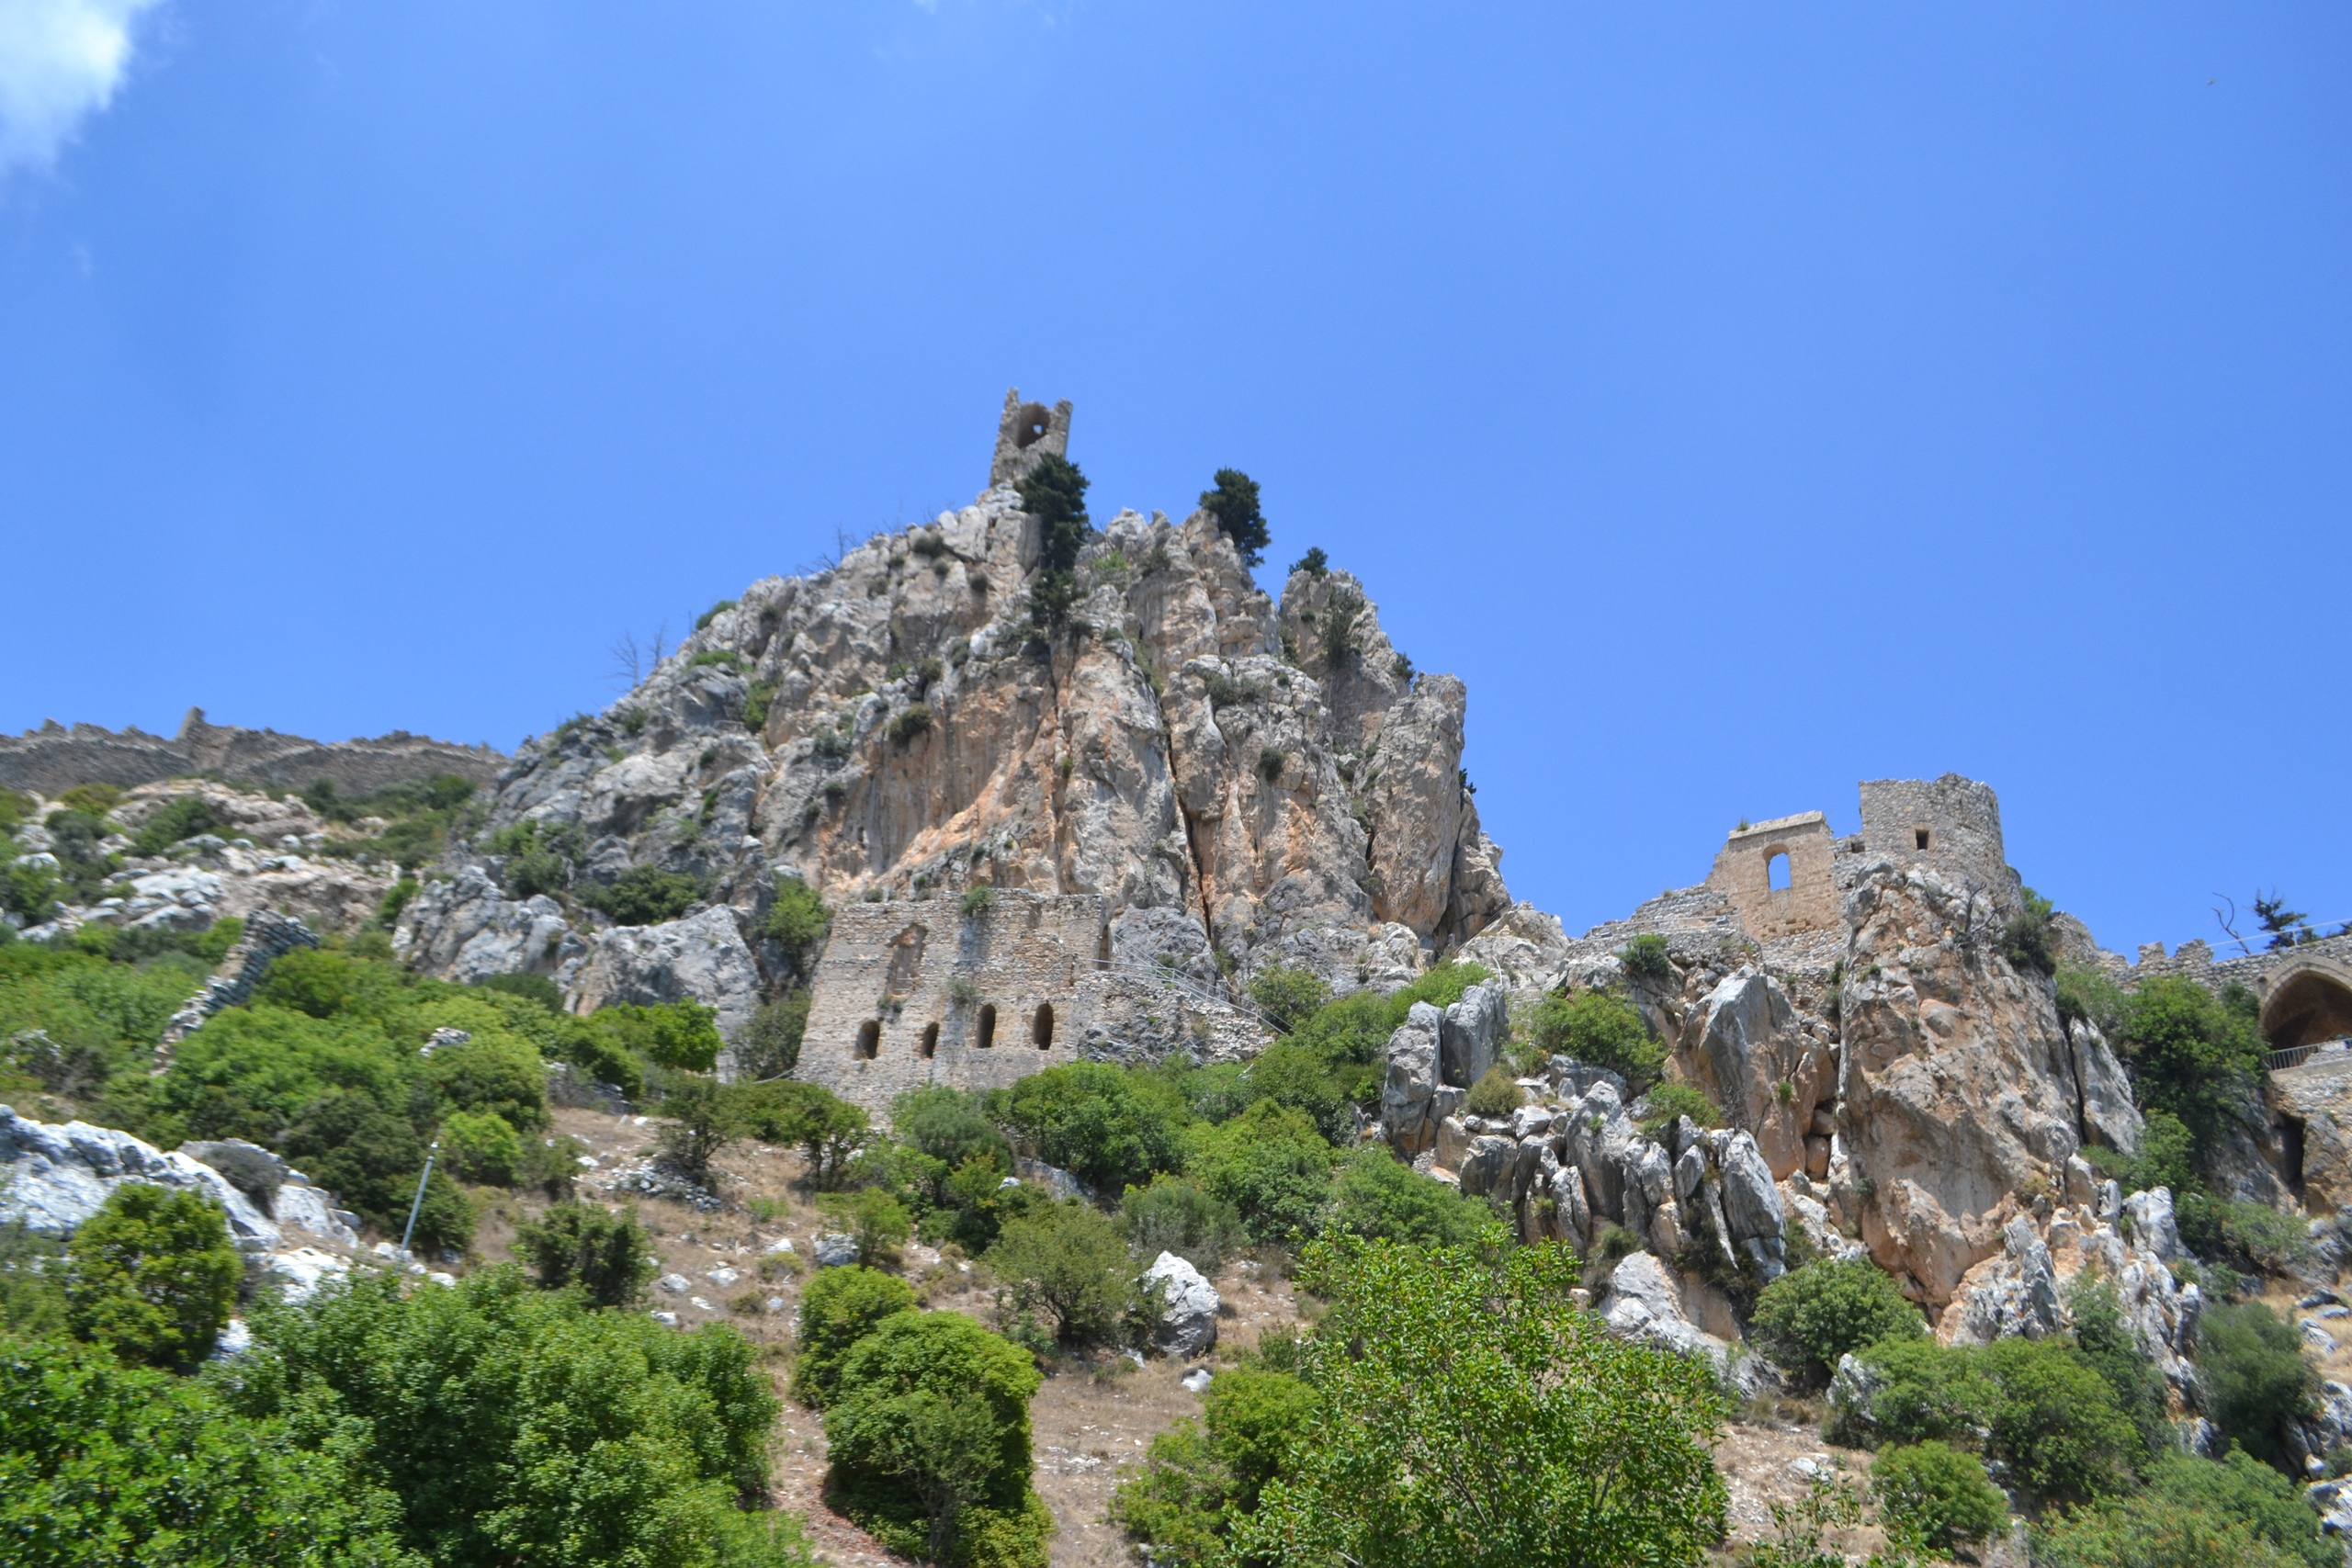 Северный Кипр. Замок Святого Иллариона. (фото). X8L3AB5D4Sw